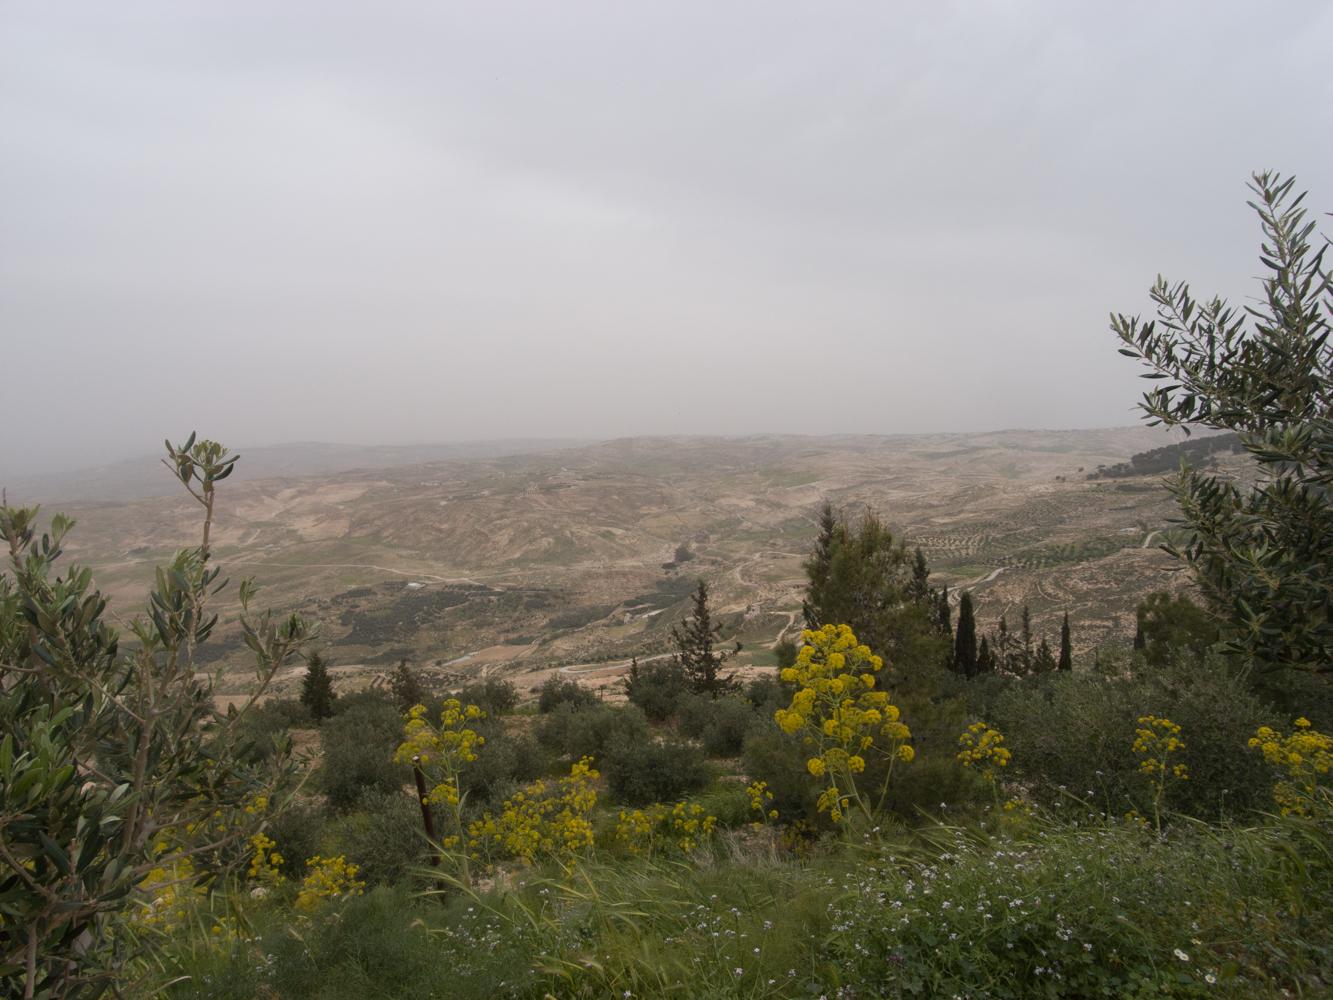 Jordanien_Aqaba_Rotes_Meer_Amman_Fotos-19